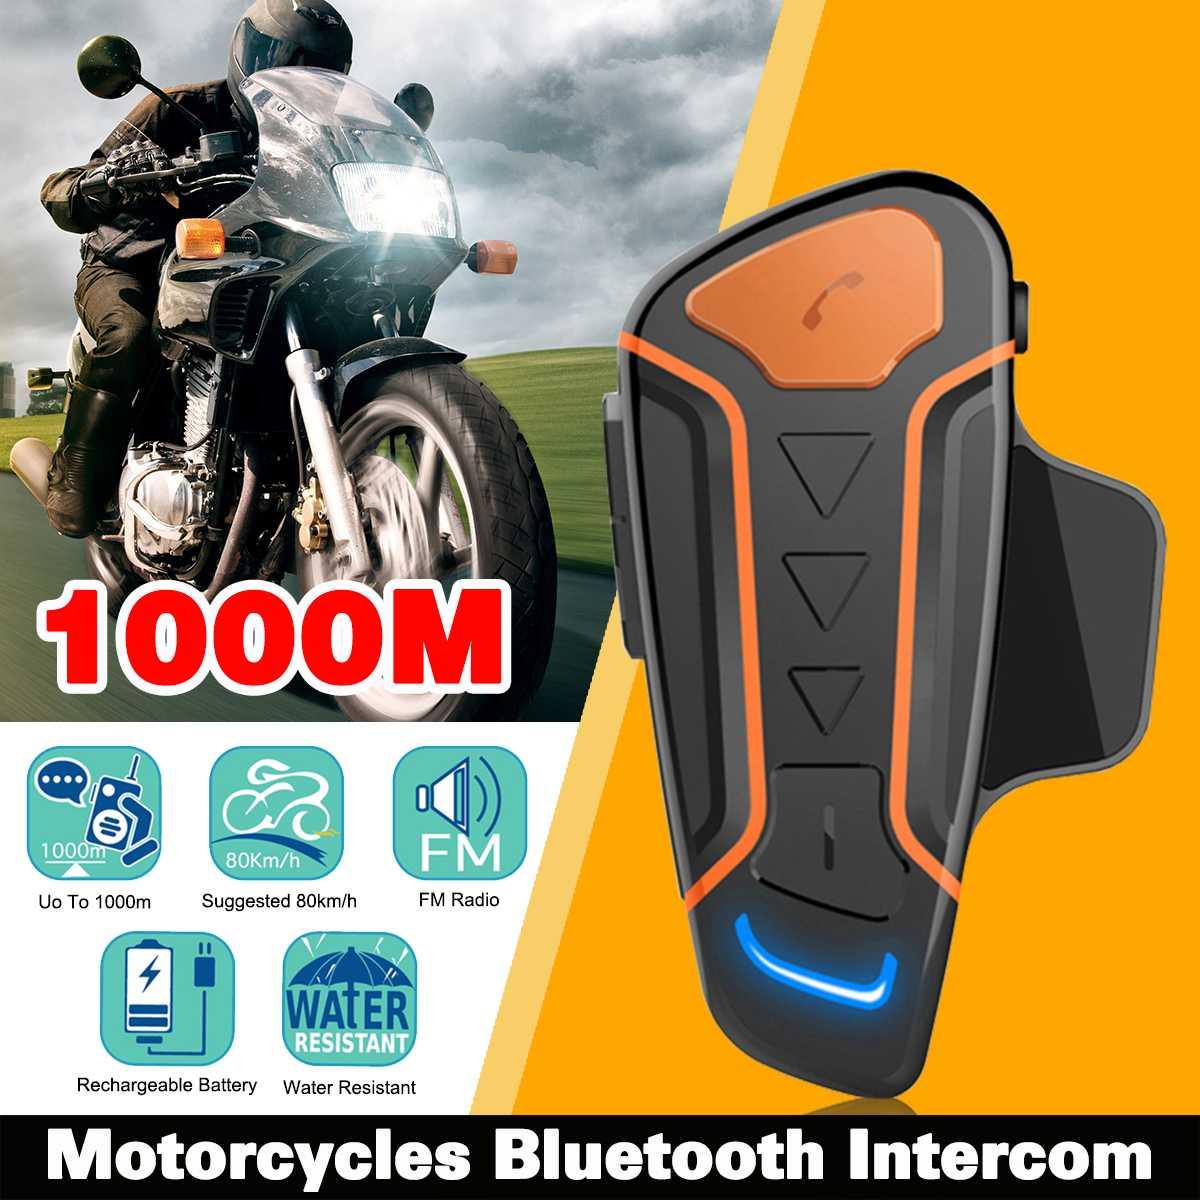 2PCS IP67 Waterproof 100% Motorcycle Helmet Intercom WT003 1000m Moto Bluetooth Interphone Headset With FM Radio MP3